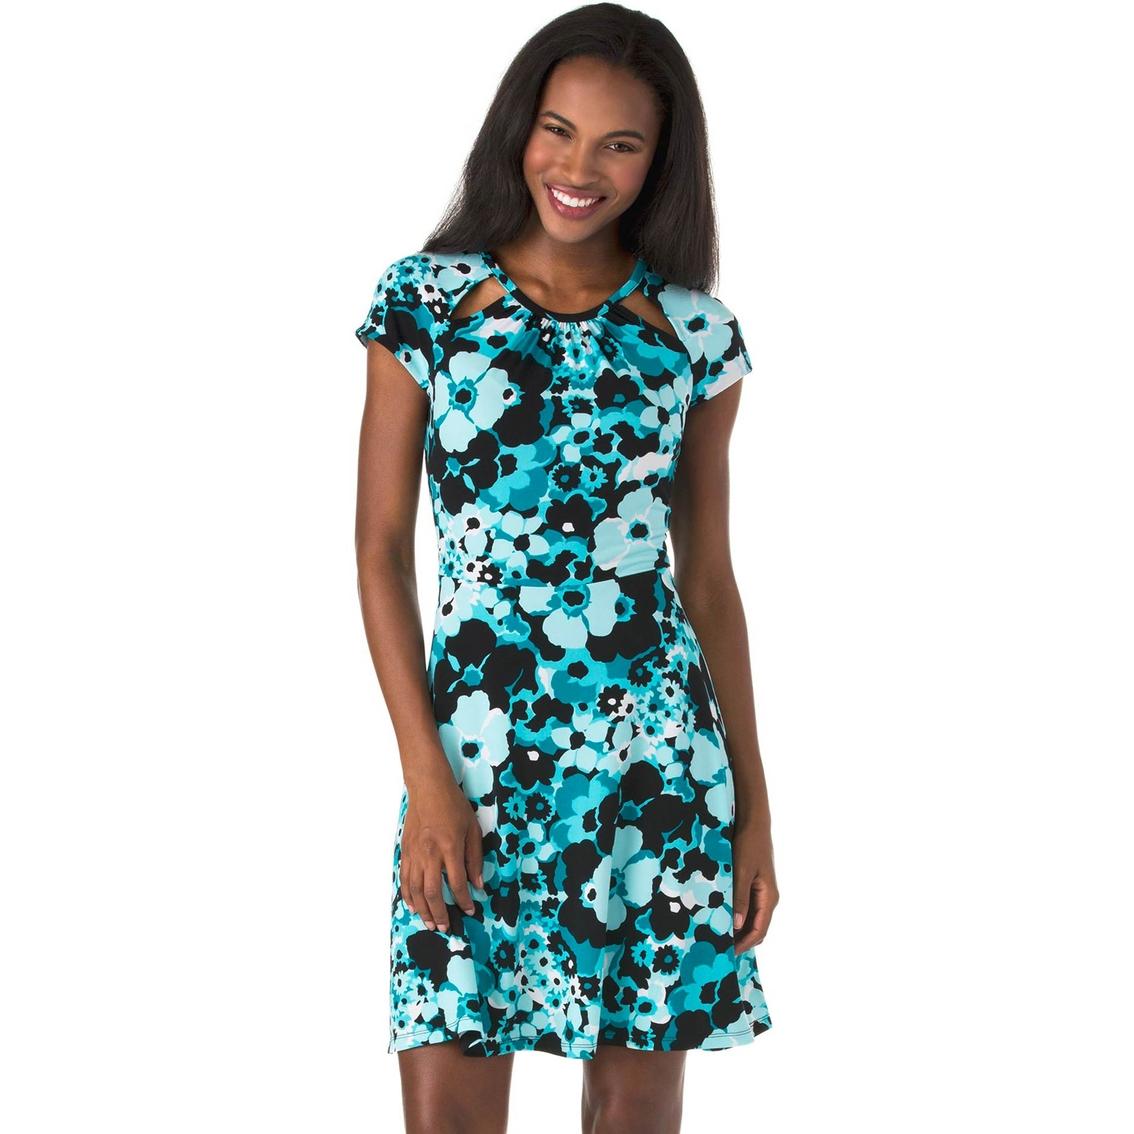 Michael Kors Springtime Floral Dress   Apparel   Apparel   Shop The ...